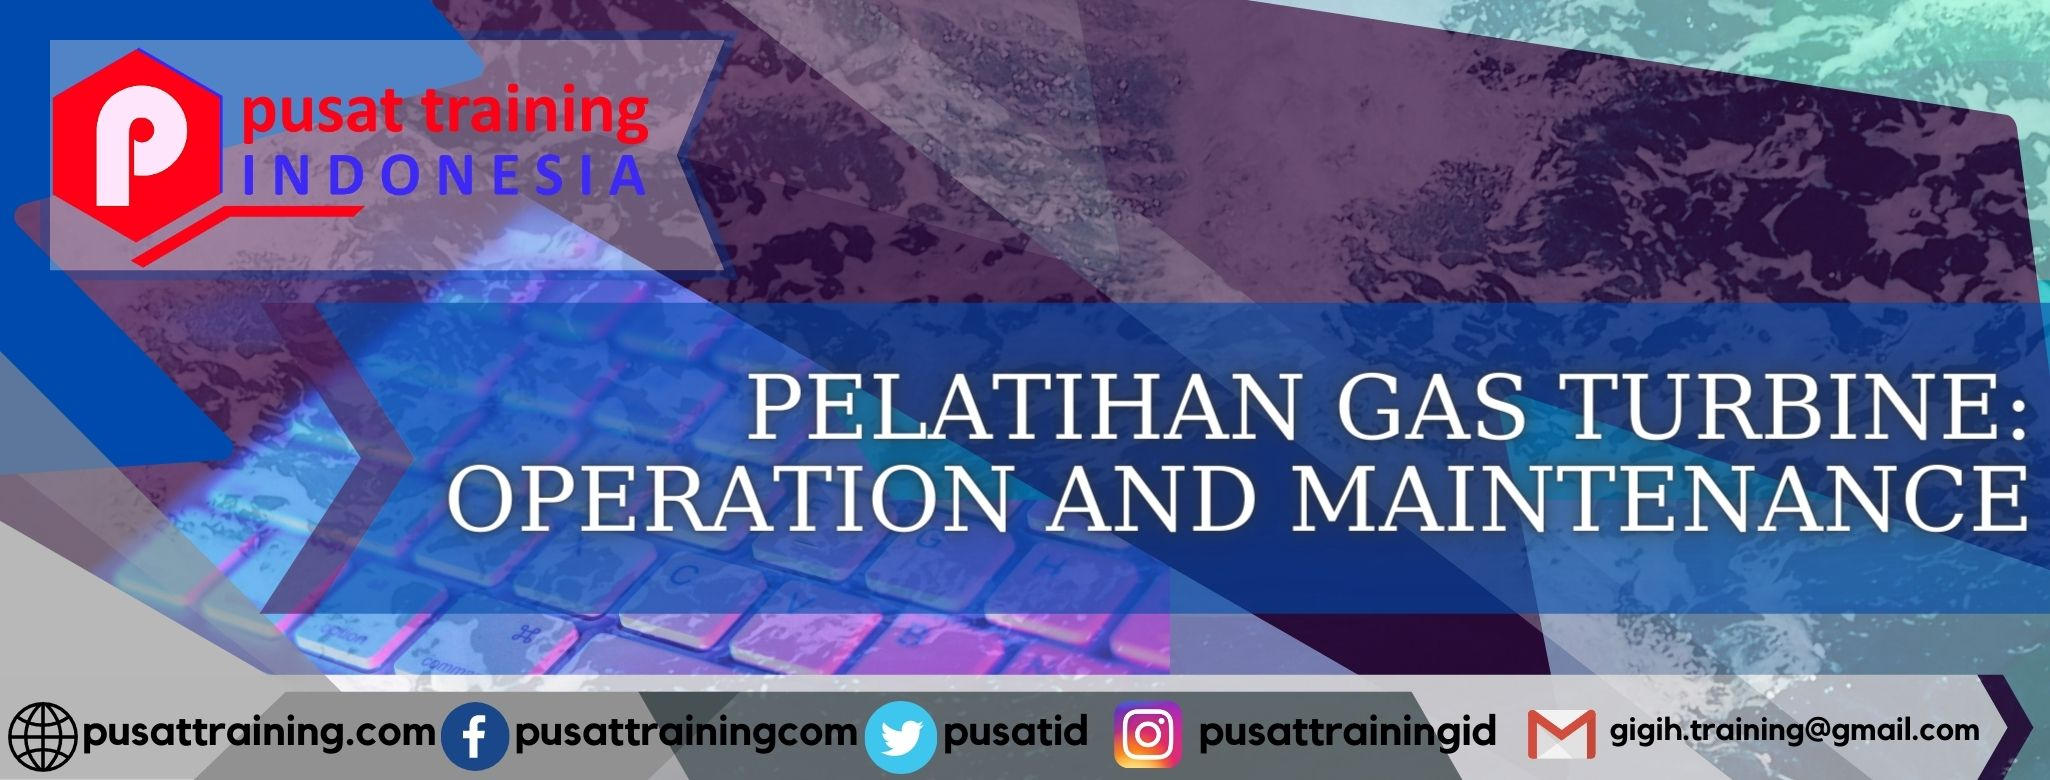 pelatihan-gas-turbine-operation-and-maintenance